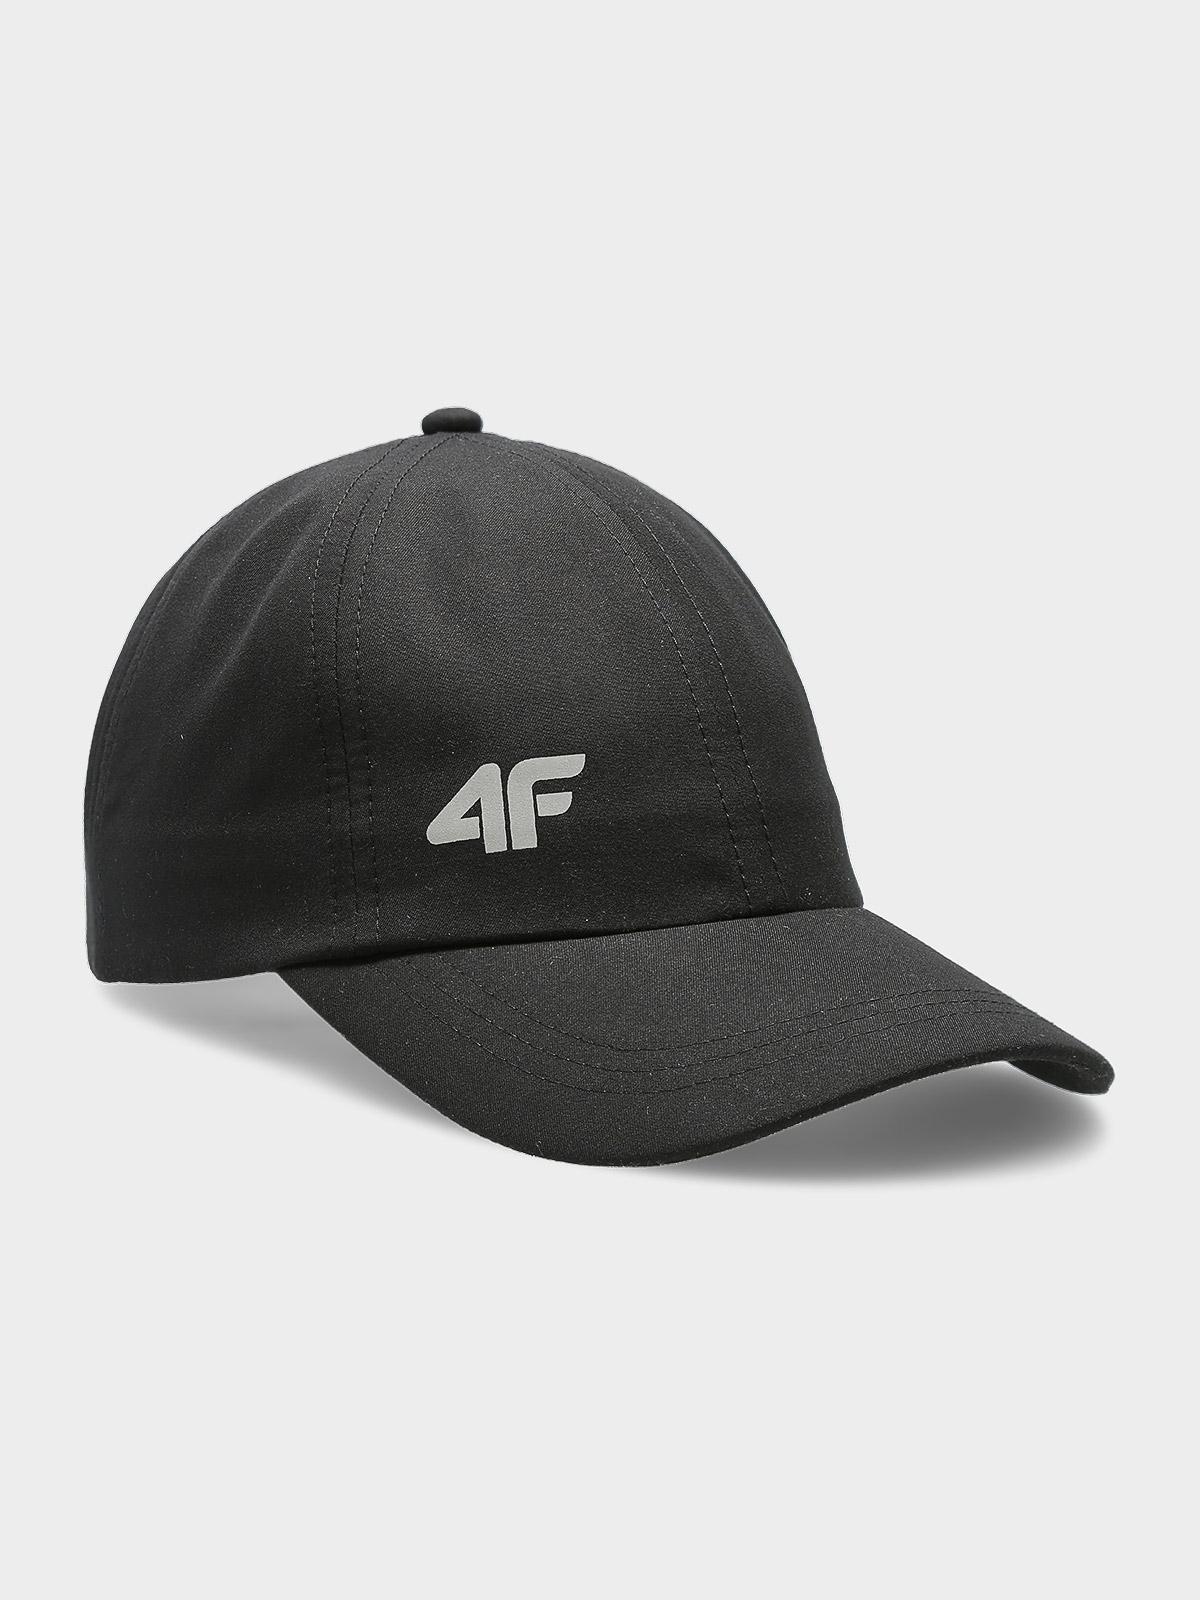 CAP 4F BOY JCAM204